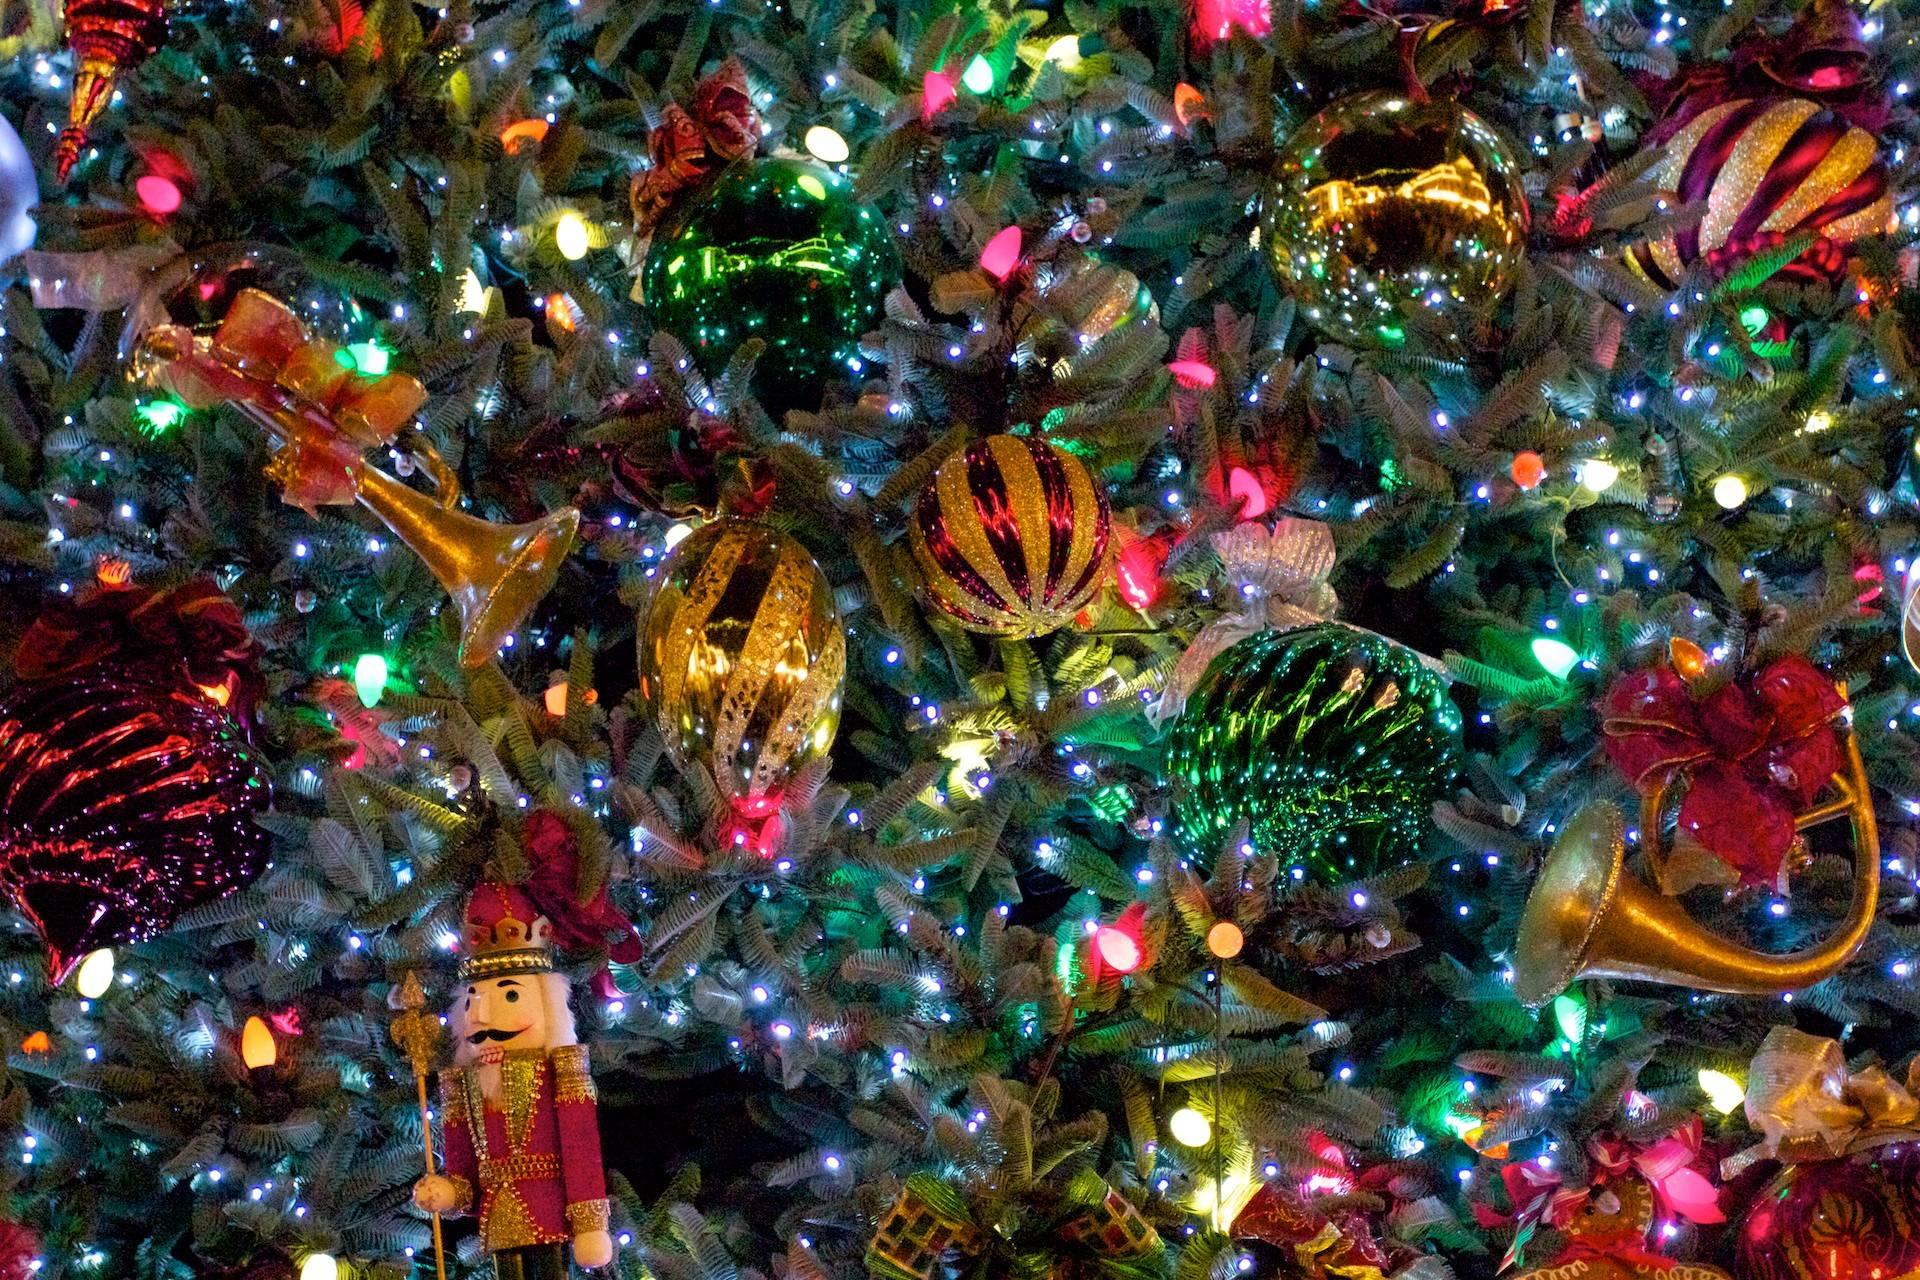 Free Desktop Wallpaper Christmas Trees